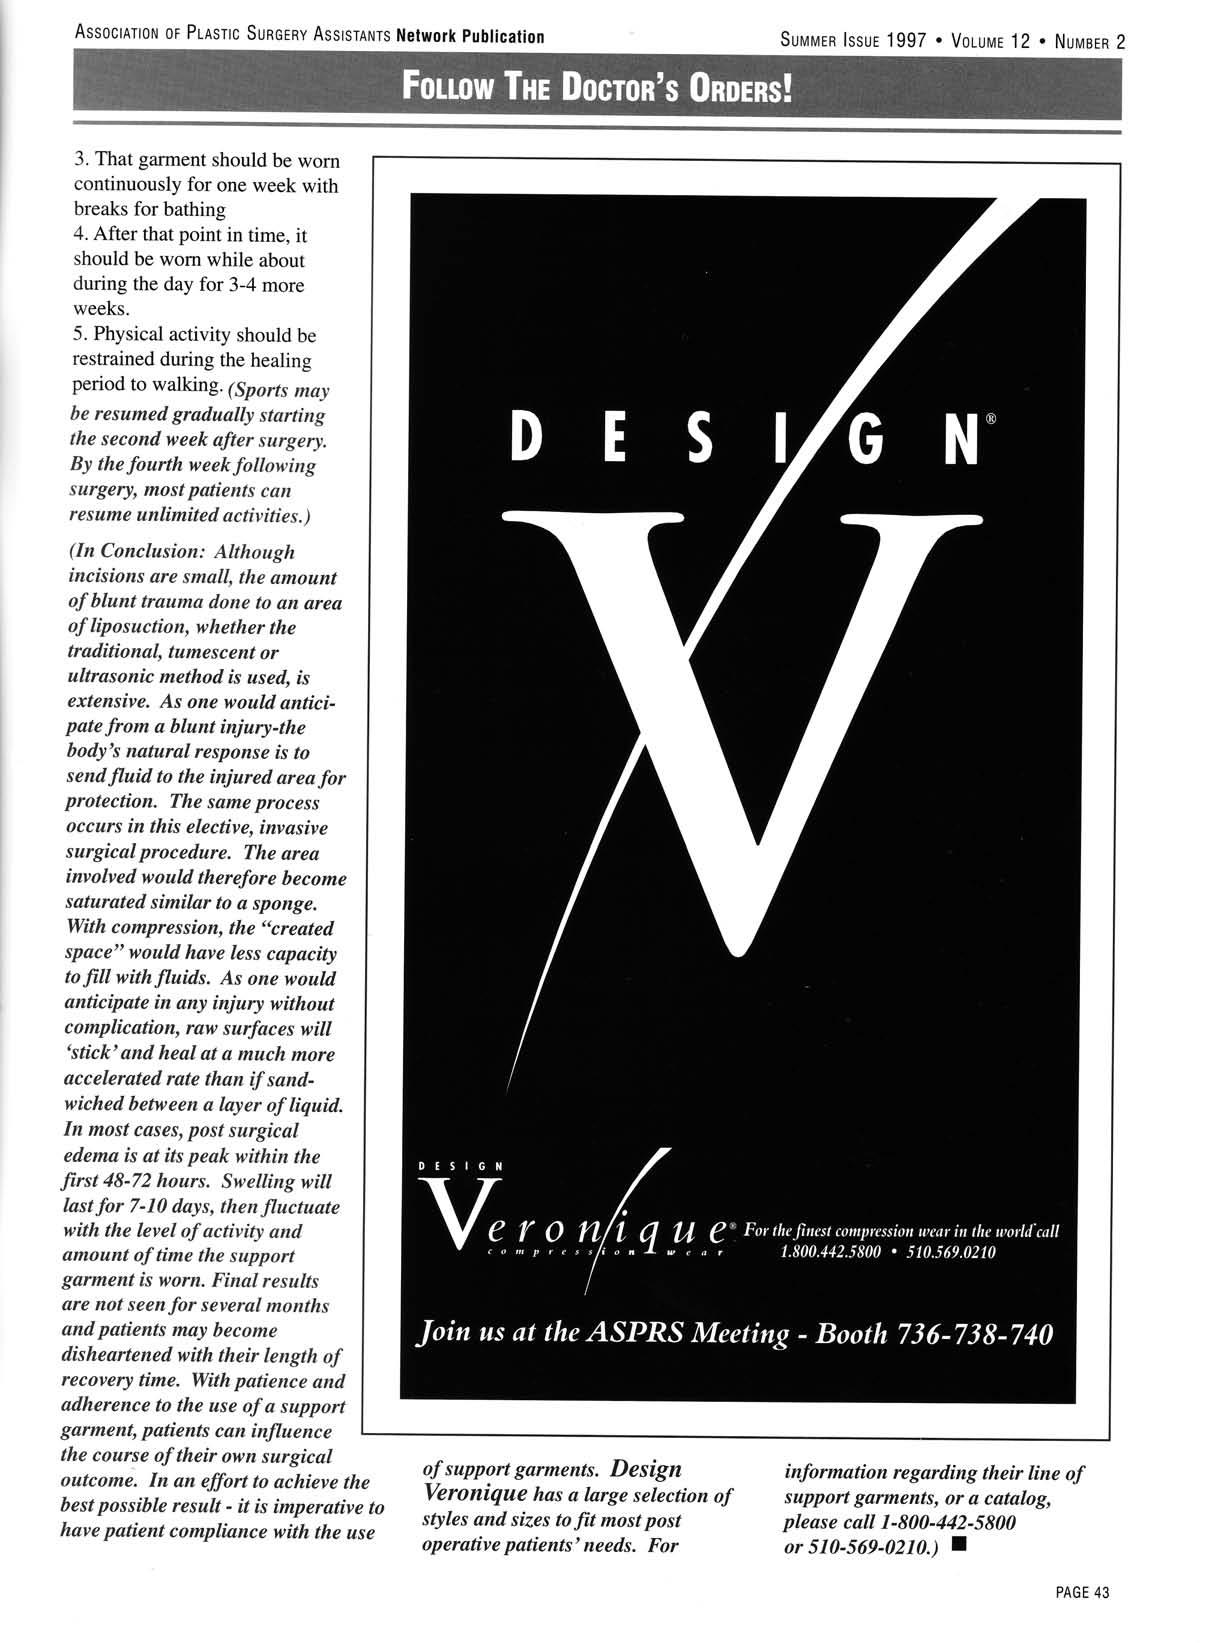 Follow The Doctor's Orders! cont. | Design Veronique